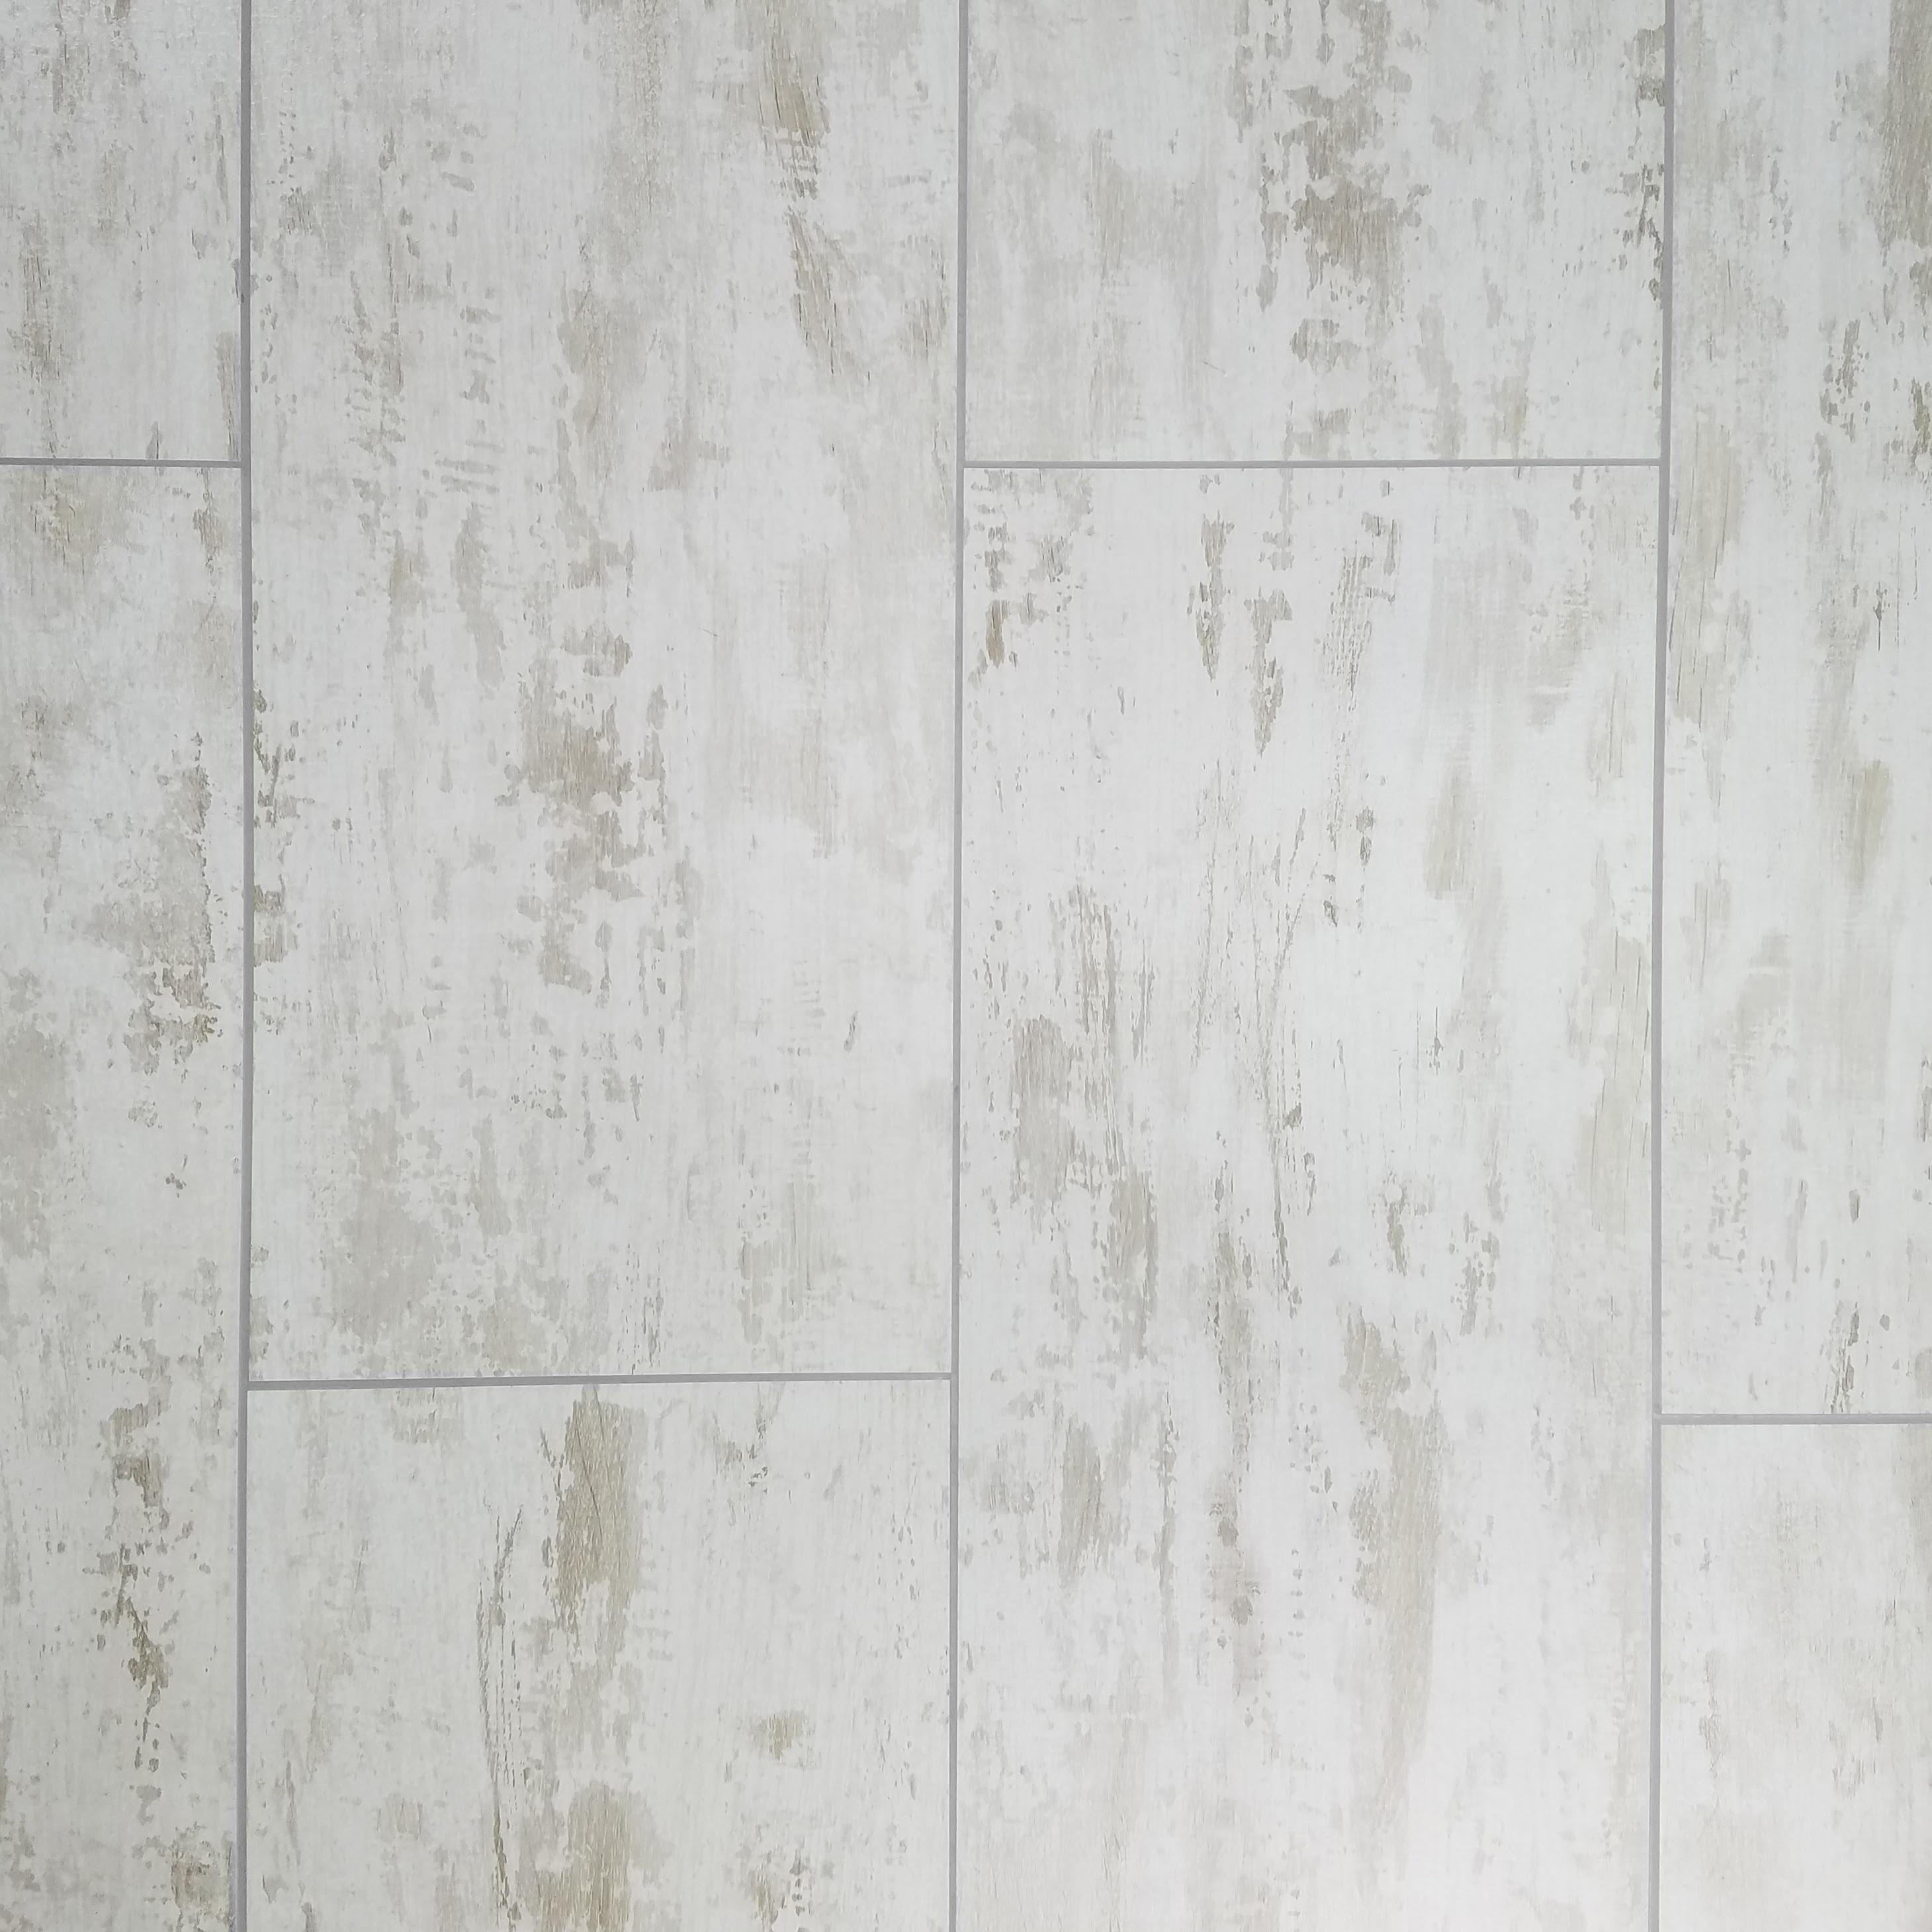 "Birchwood White Straight Edge Glossy / 7""x16"" / Flat Nature Collection 0"